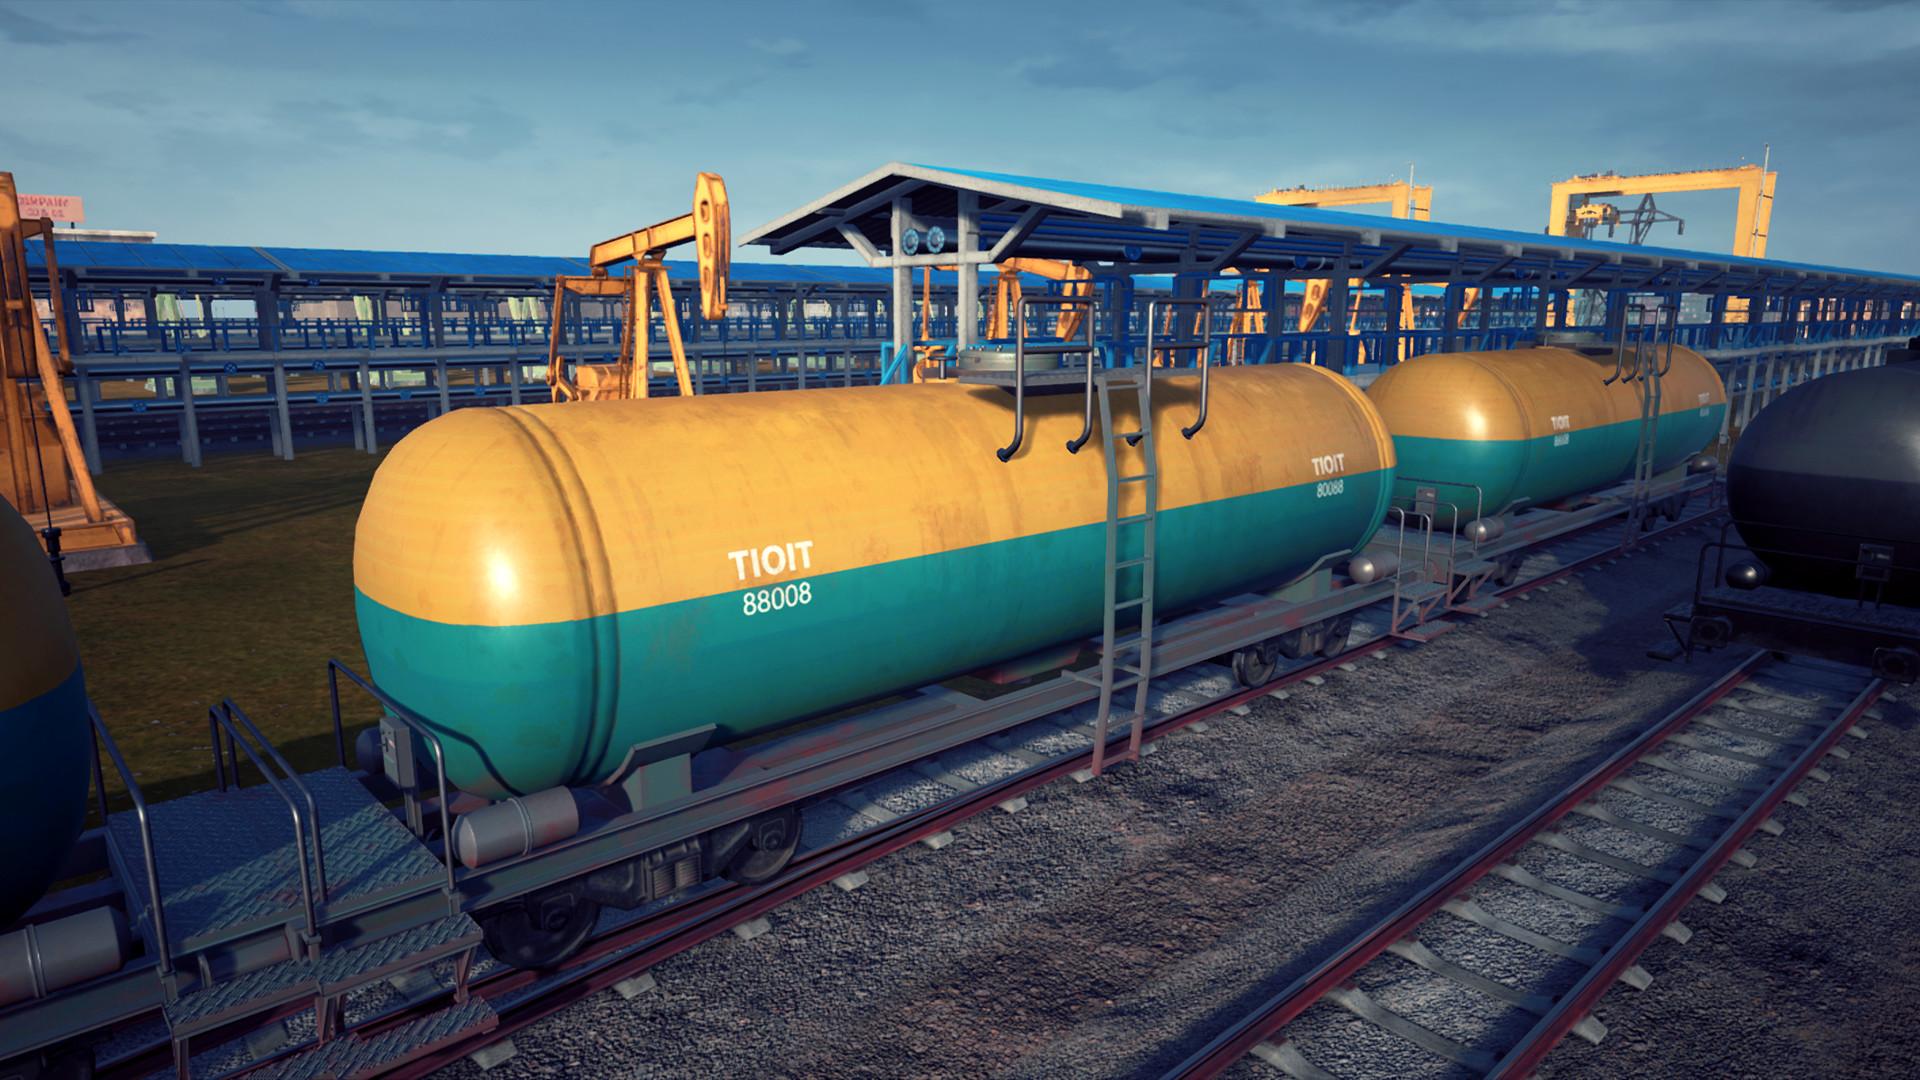 Train Life: A Railway Simulator Free Download